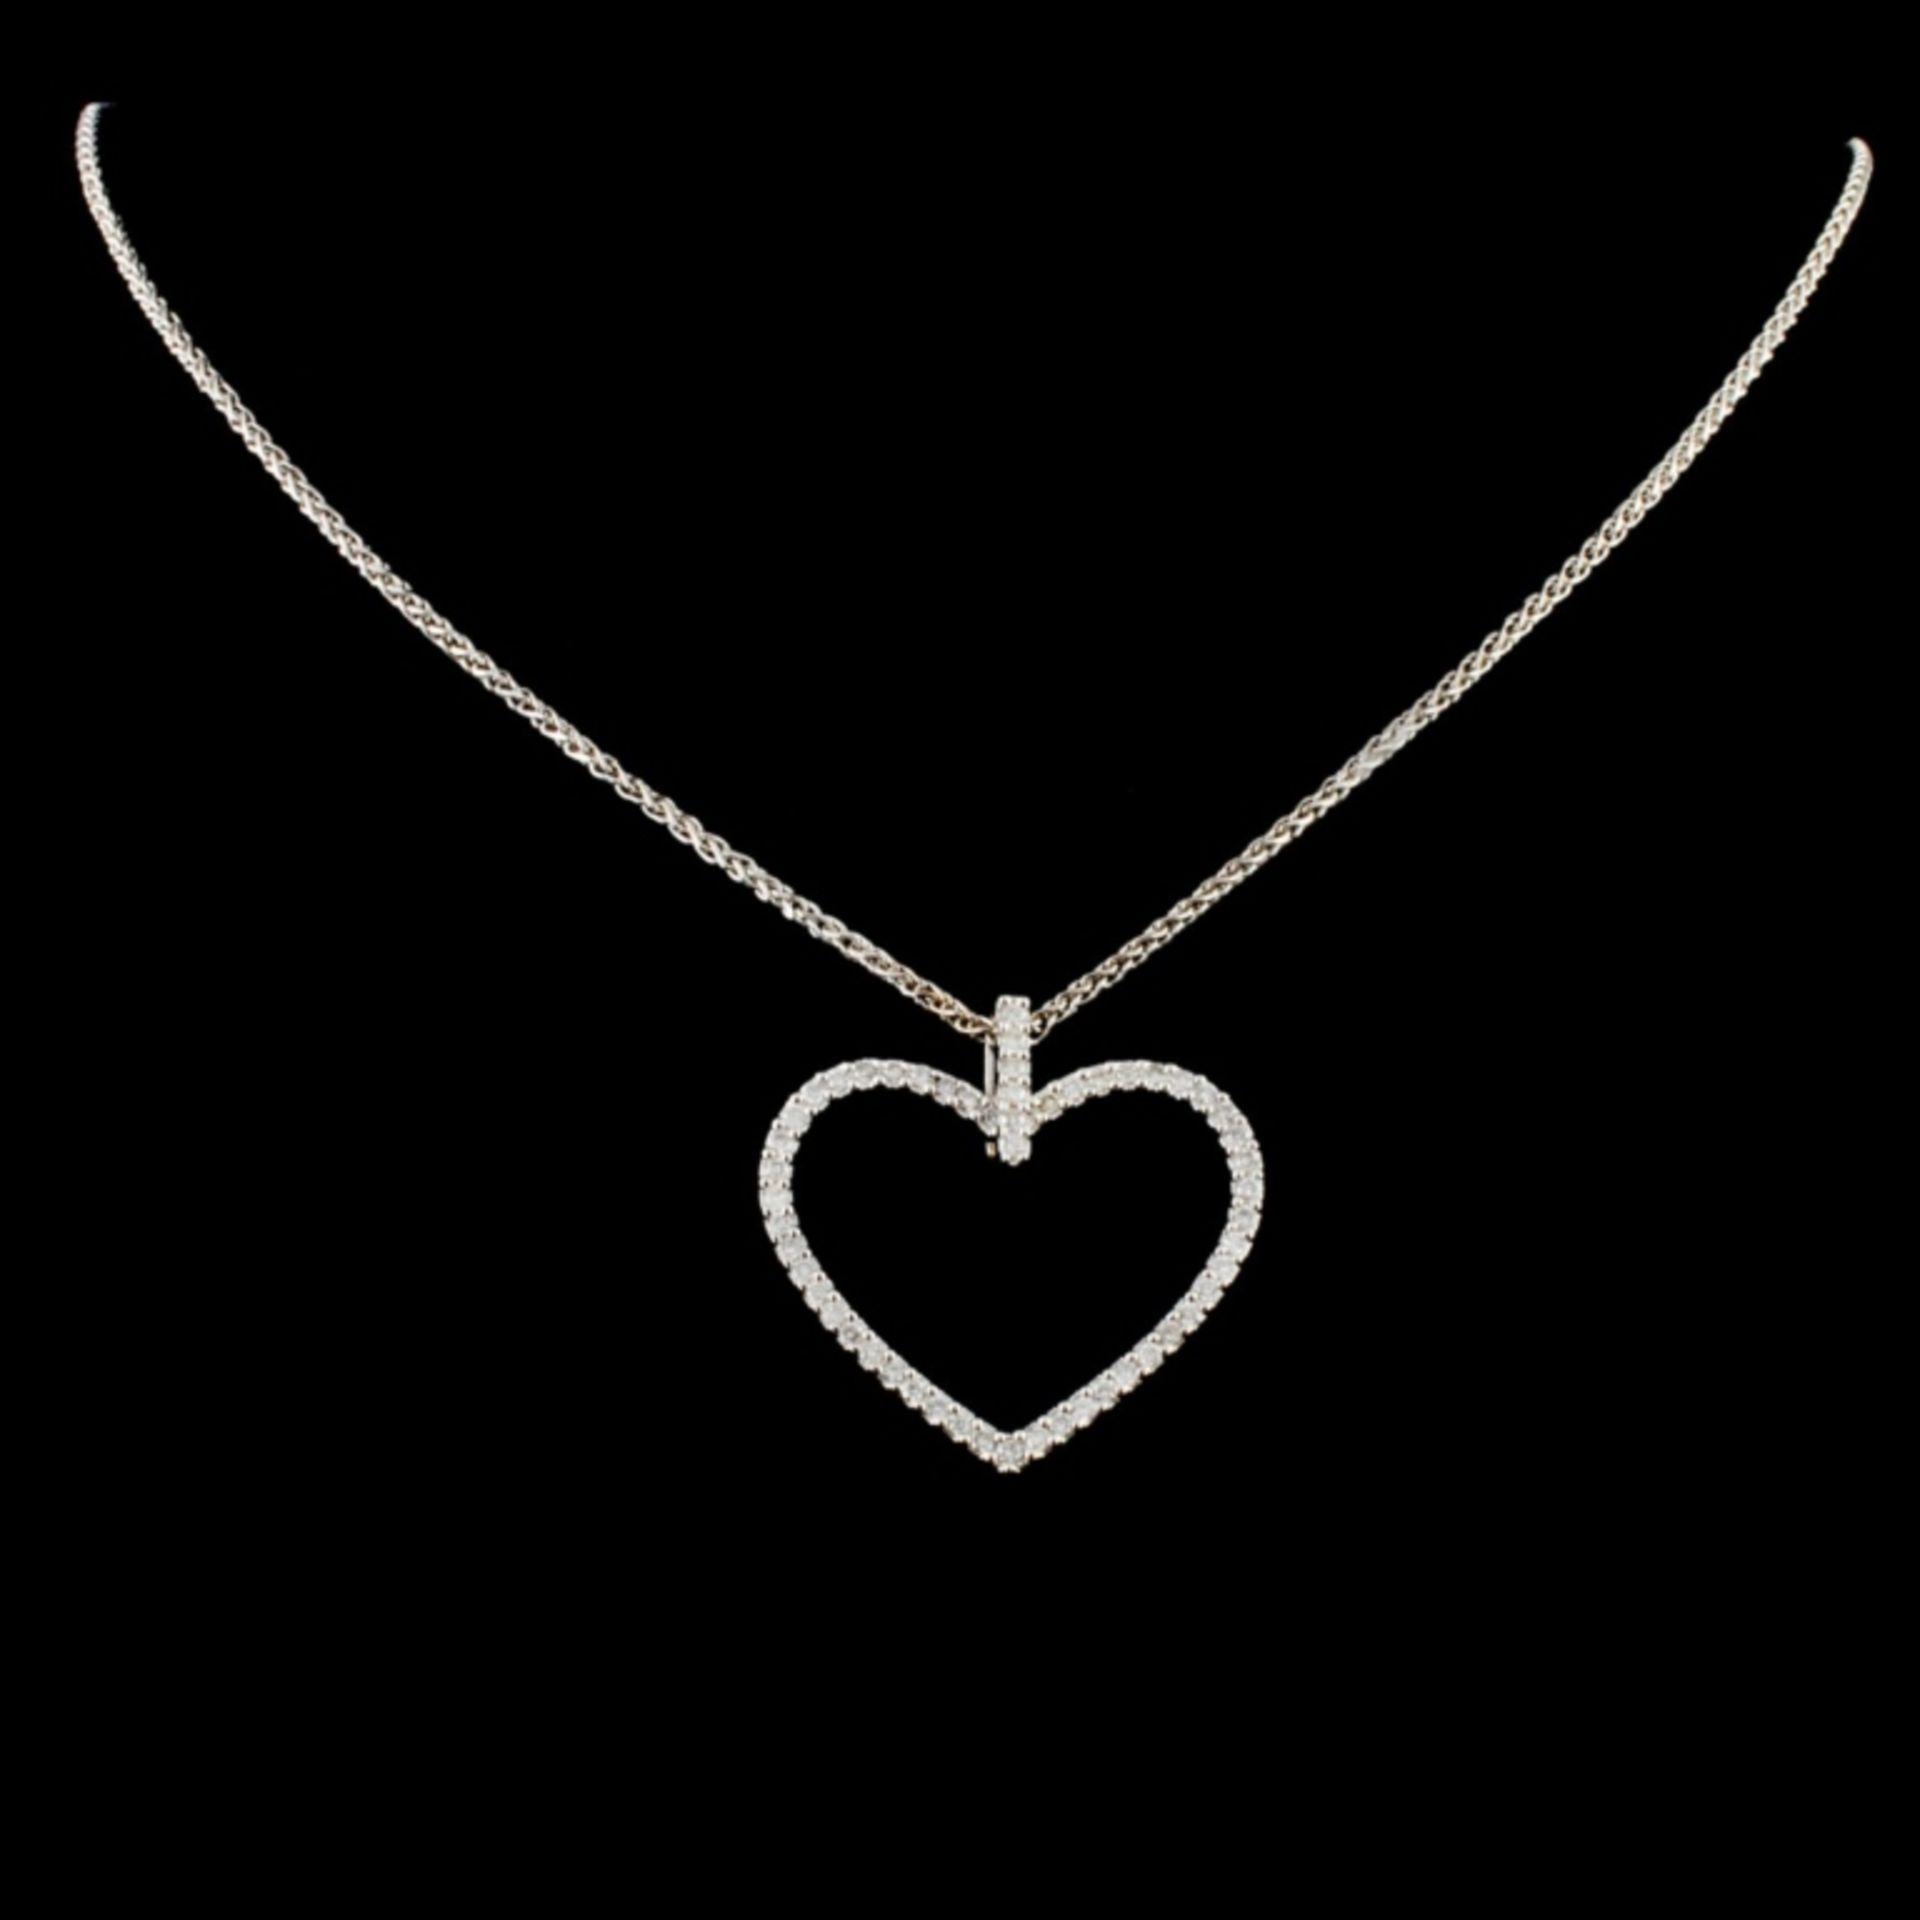 14K Gold 0.68ctw Diamond Necklace - Image 2 of 4